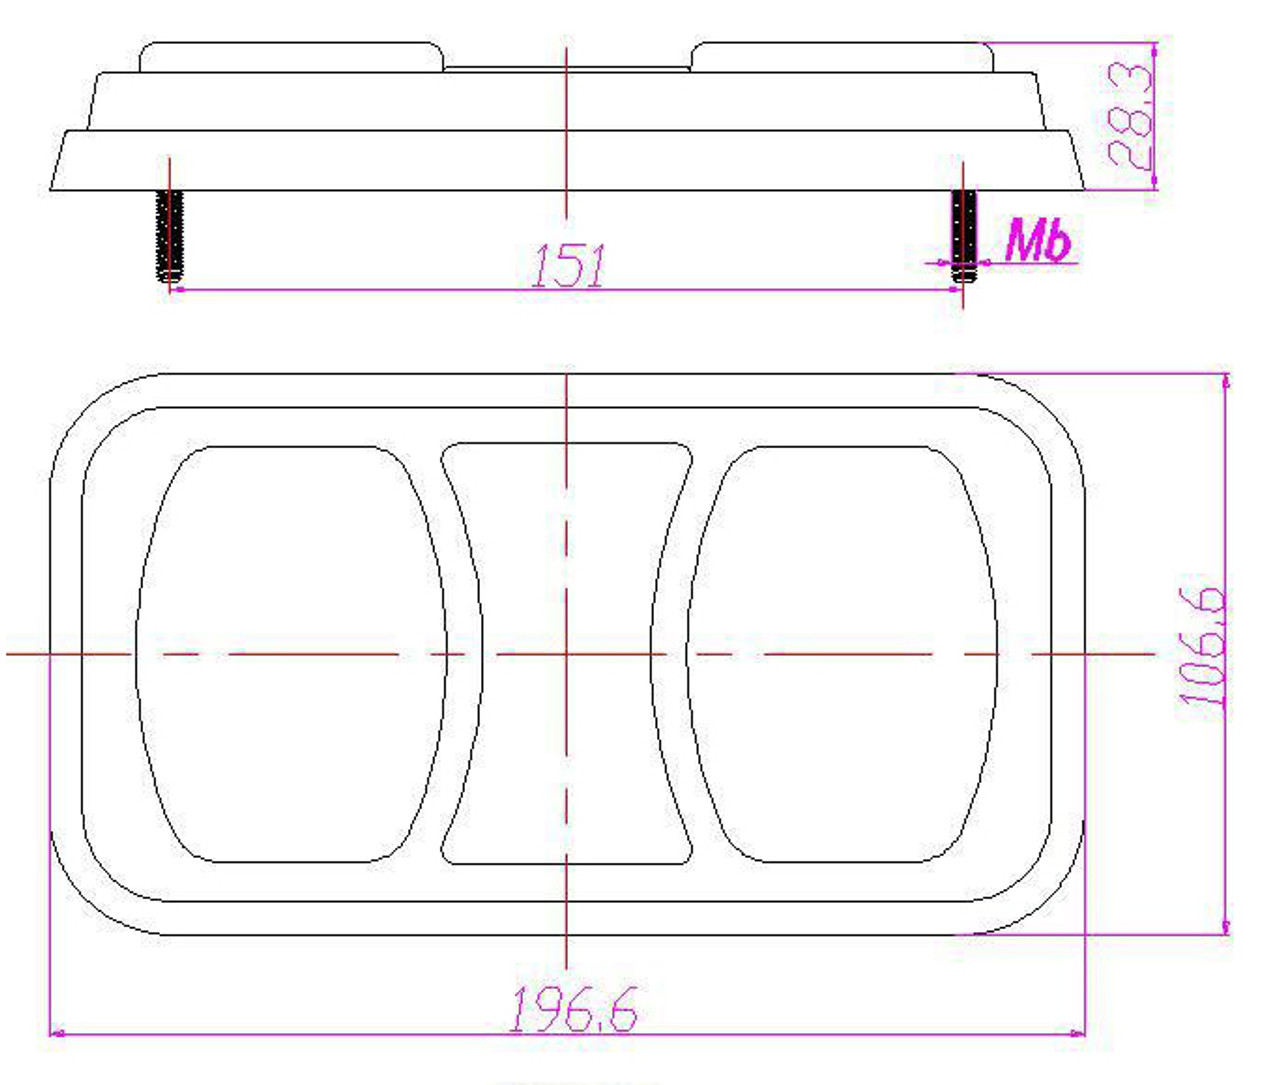 Line Drawing - BR80AR - Dimensions - 197 x 107 x 29mm